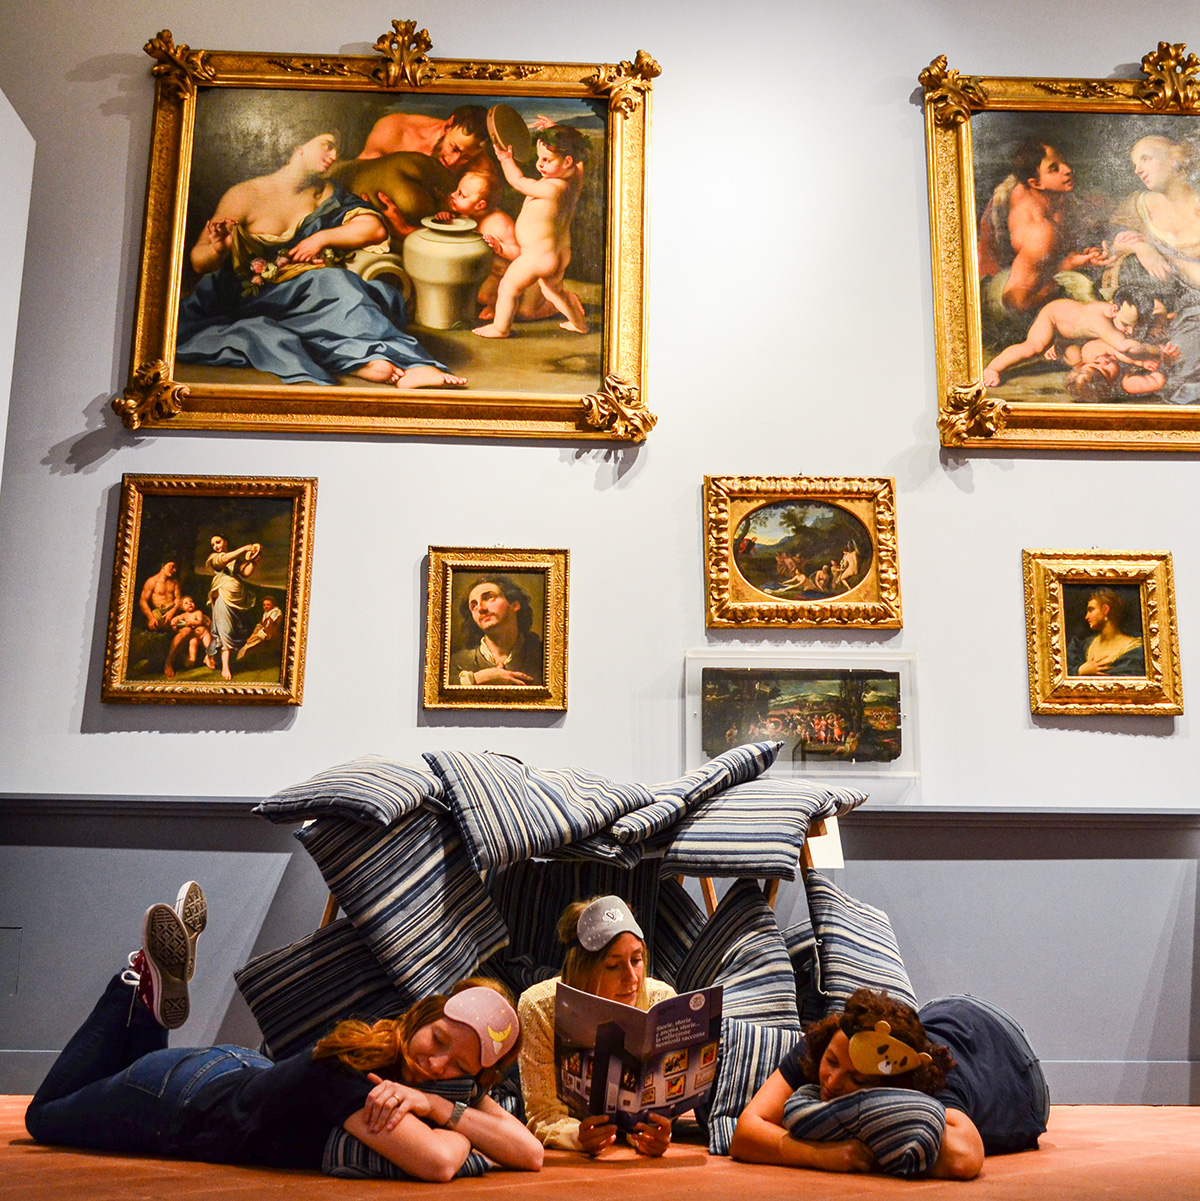 Storie, storie e ancora storie MuSei Civici Didattica Museale MoCu Modena Cultura